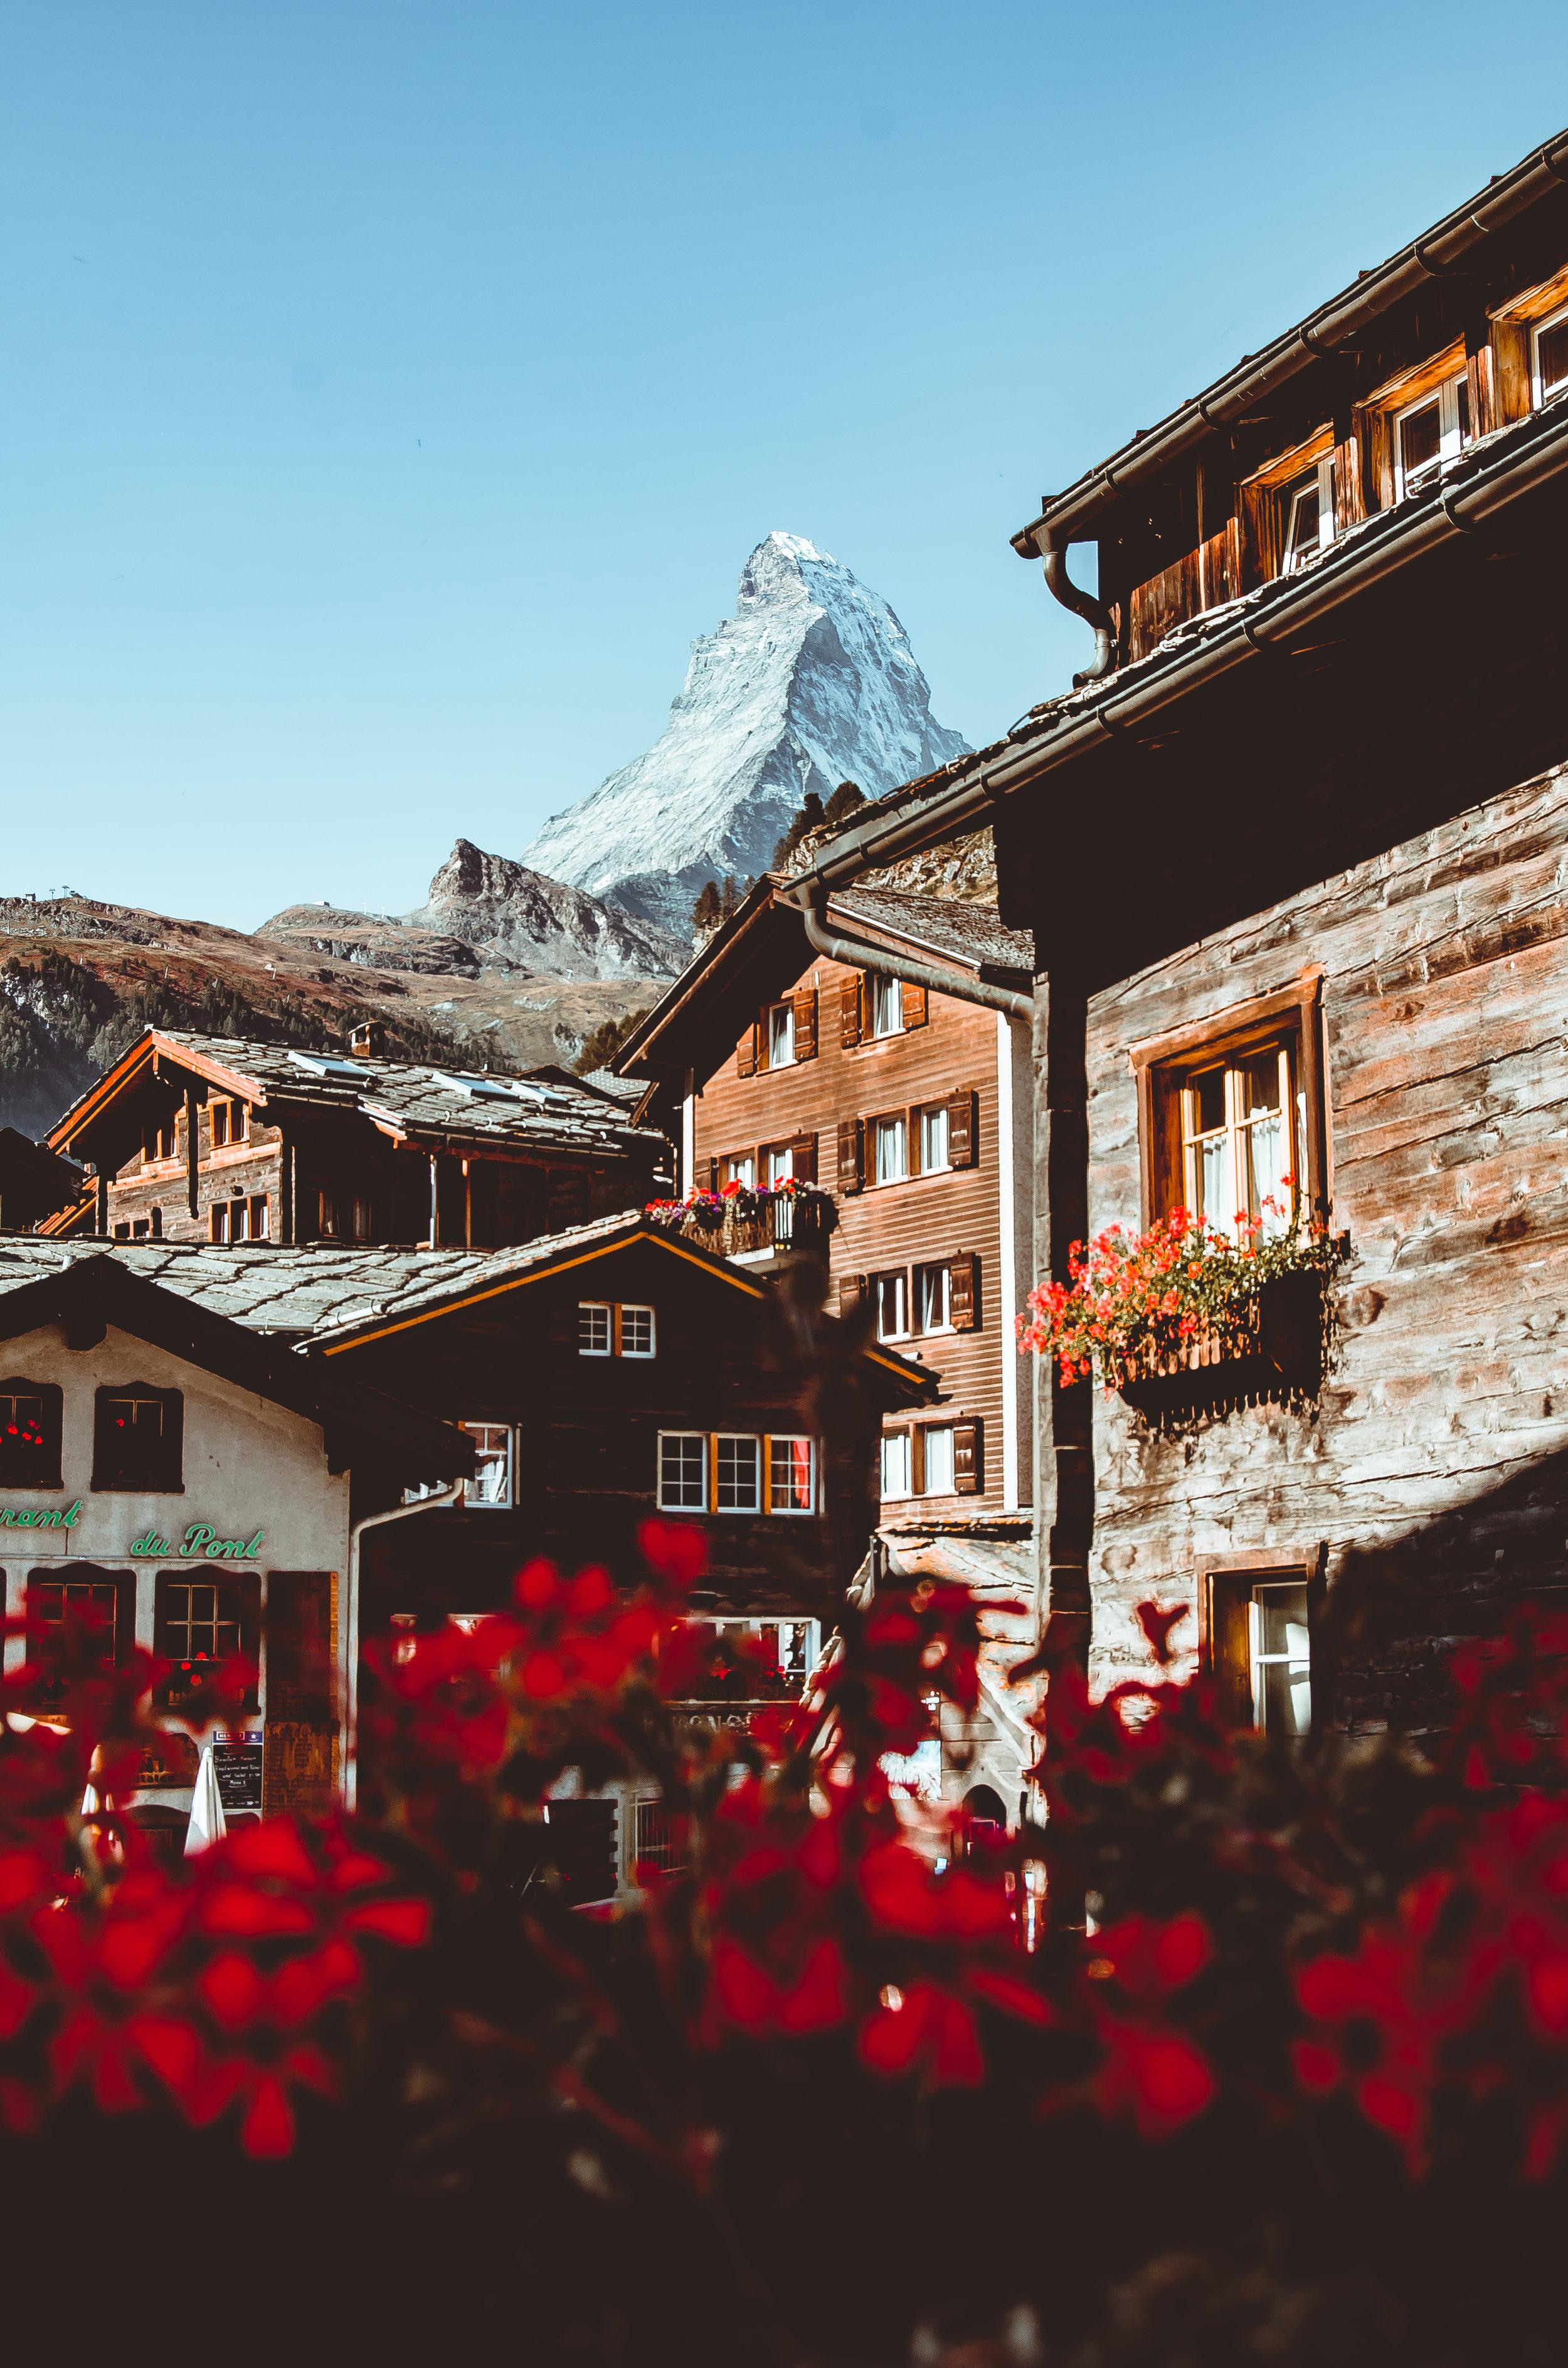 The Matterhorn overlooks the beautiful village of Zermatt below.